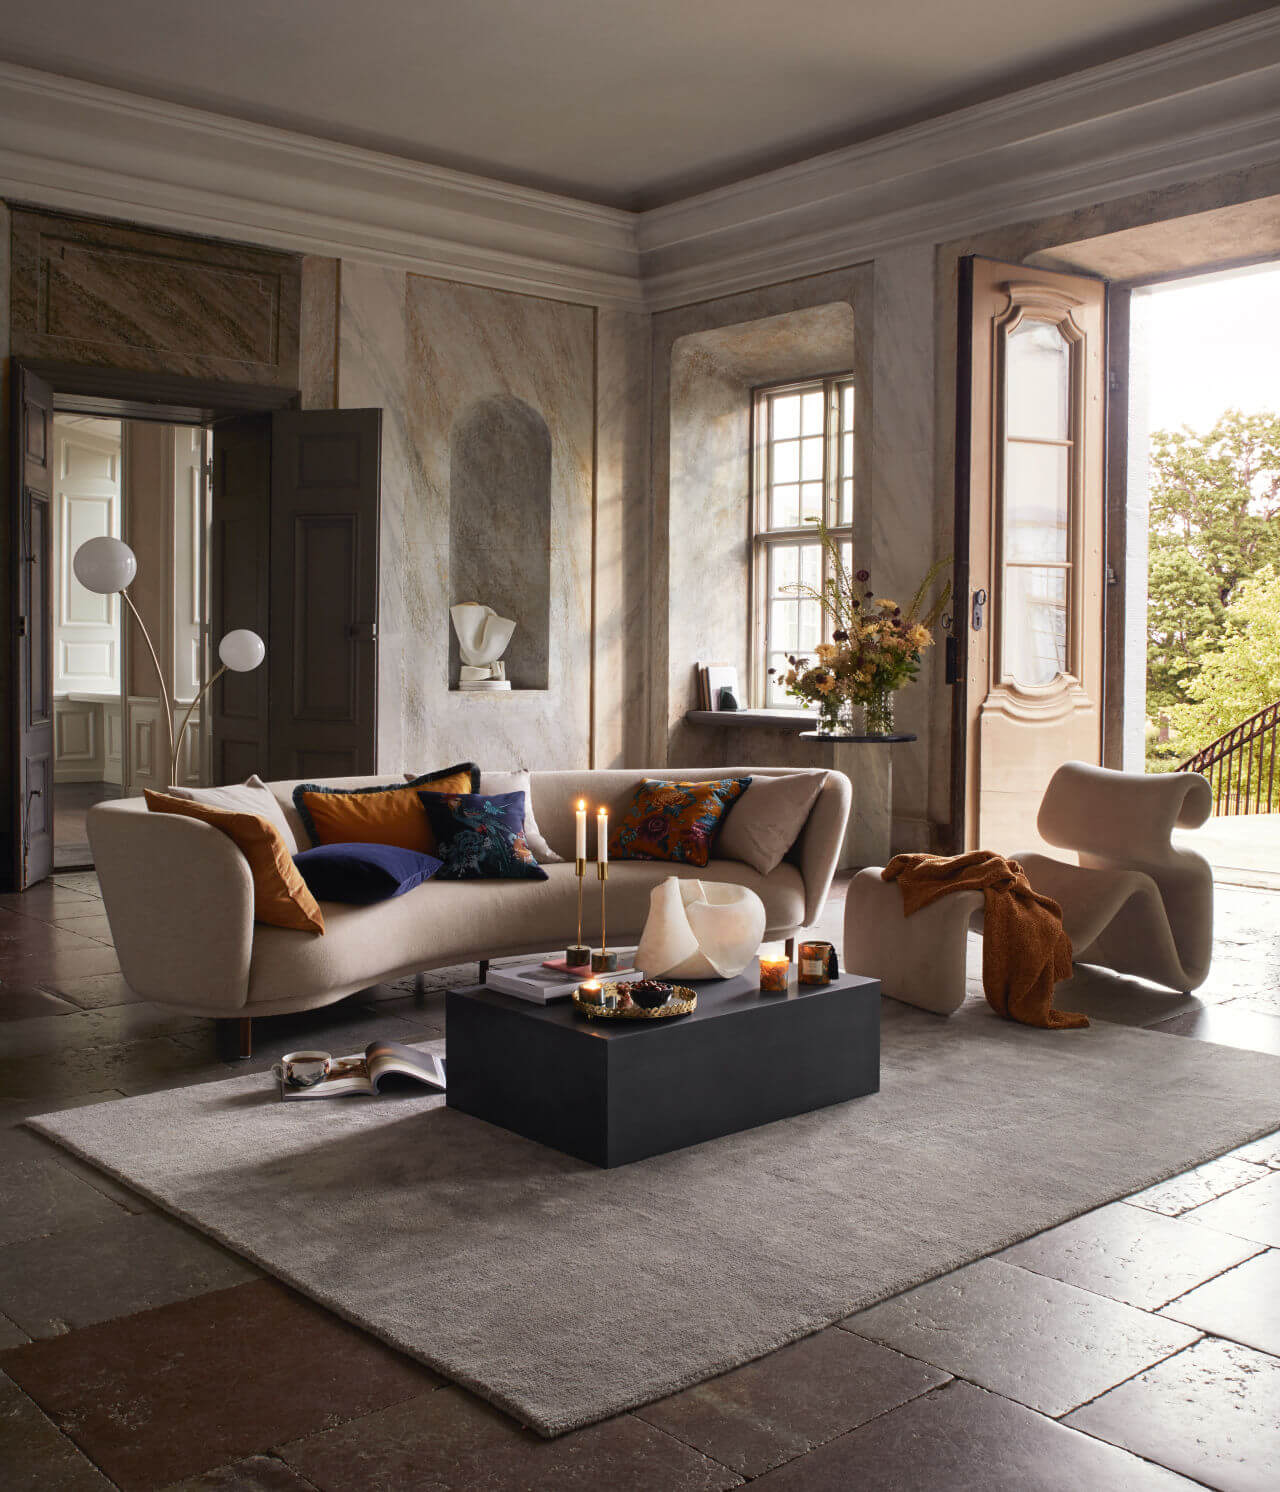 A Lush Fall Tale by H&M Home